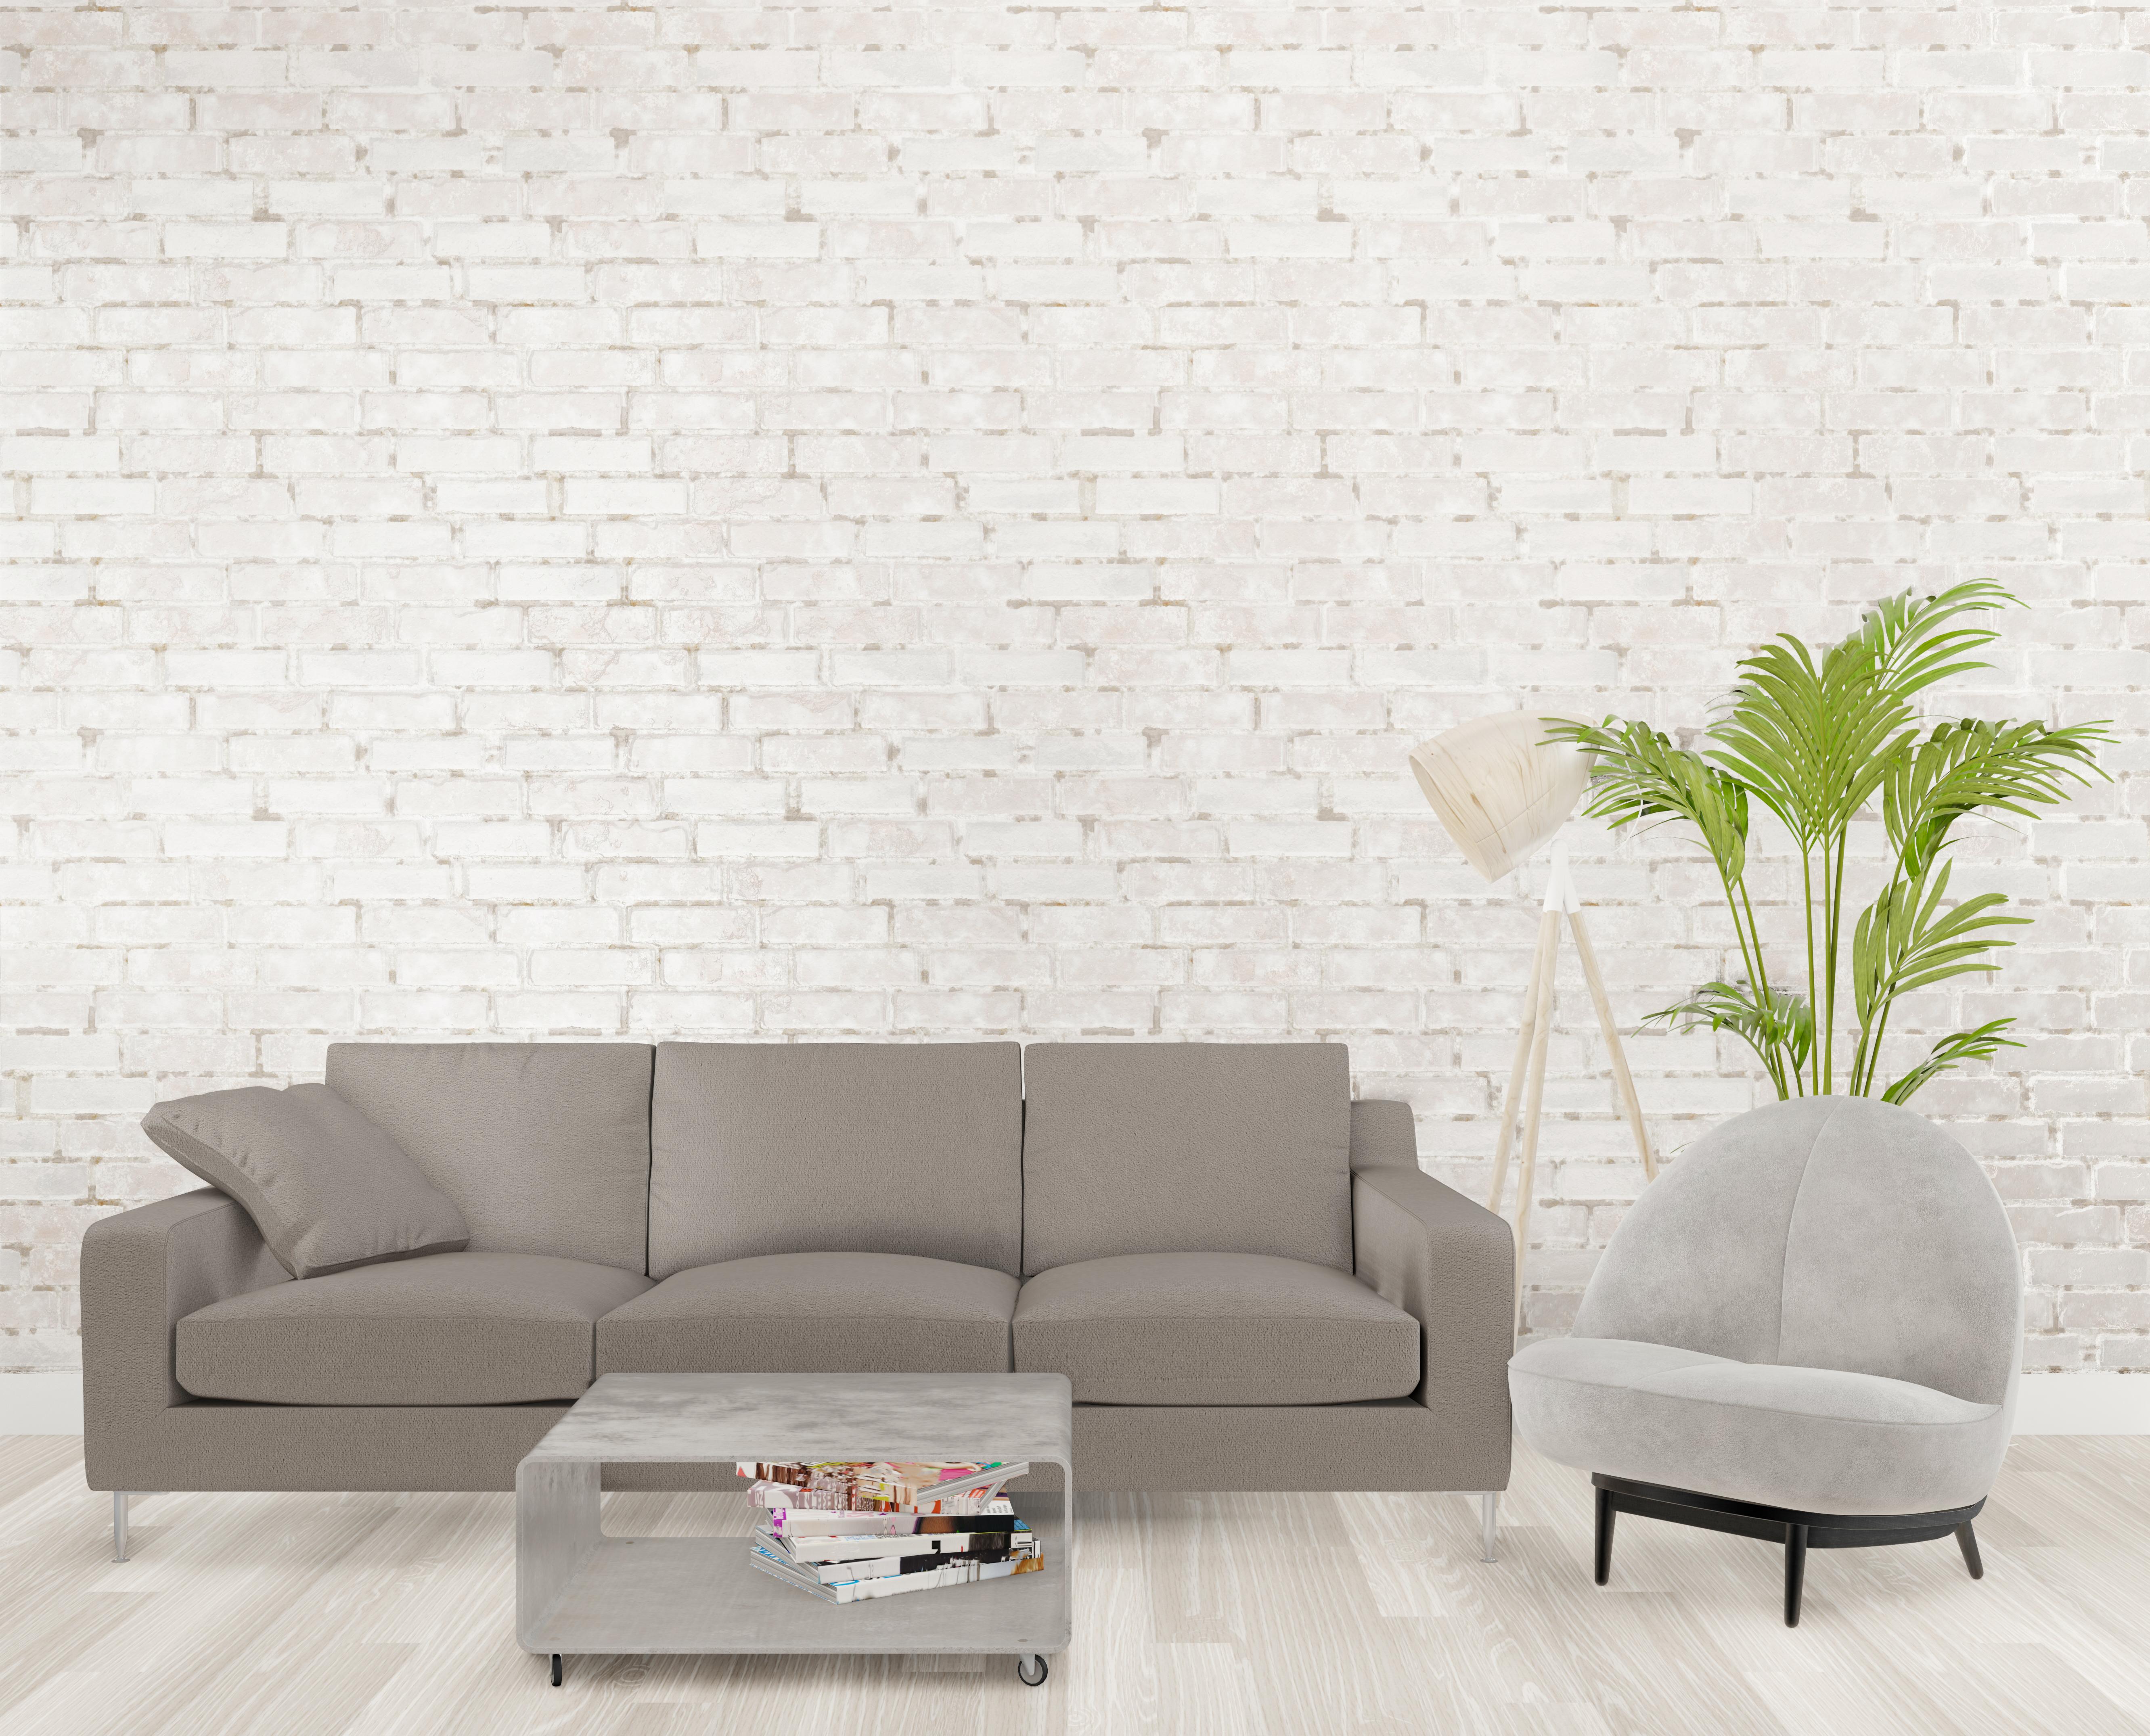 3D loft living room